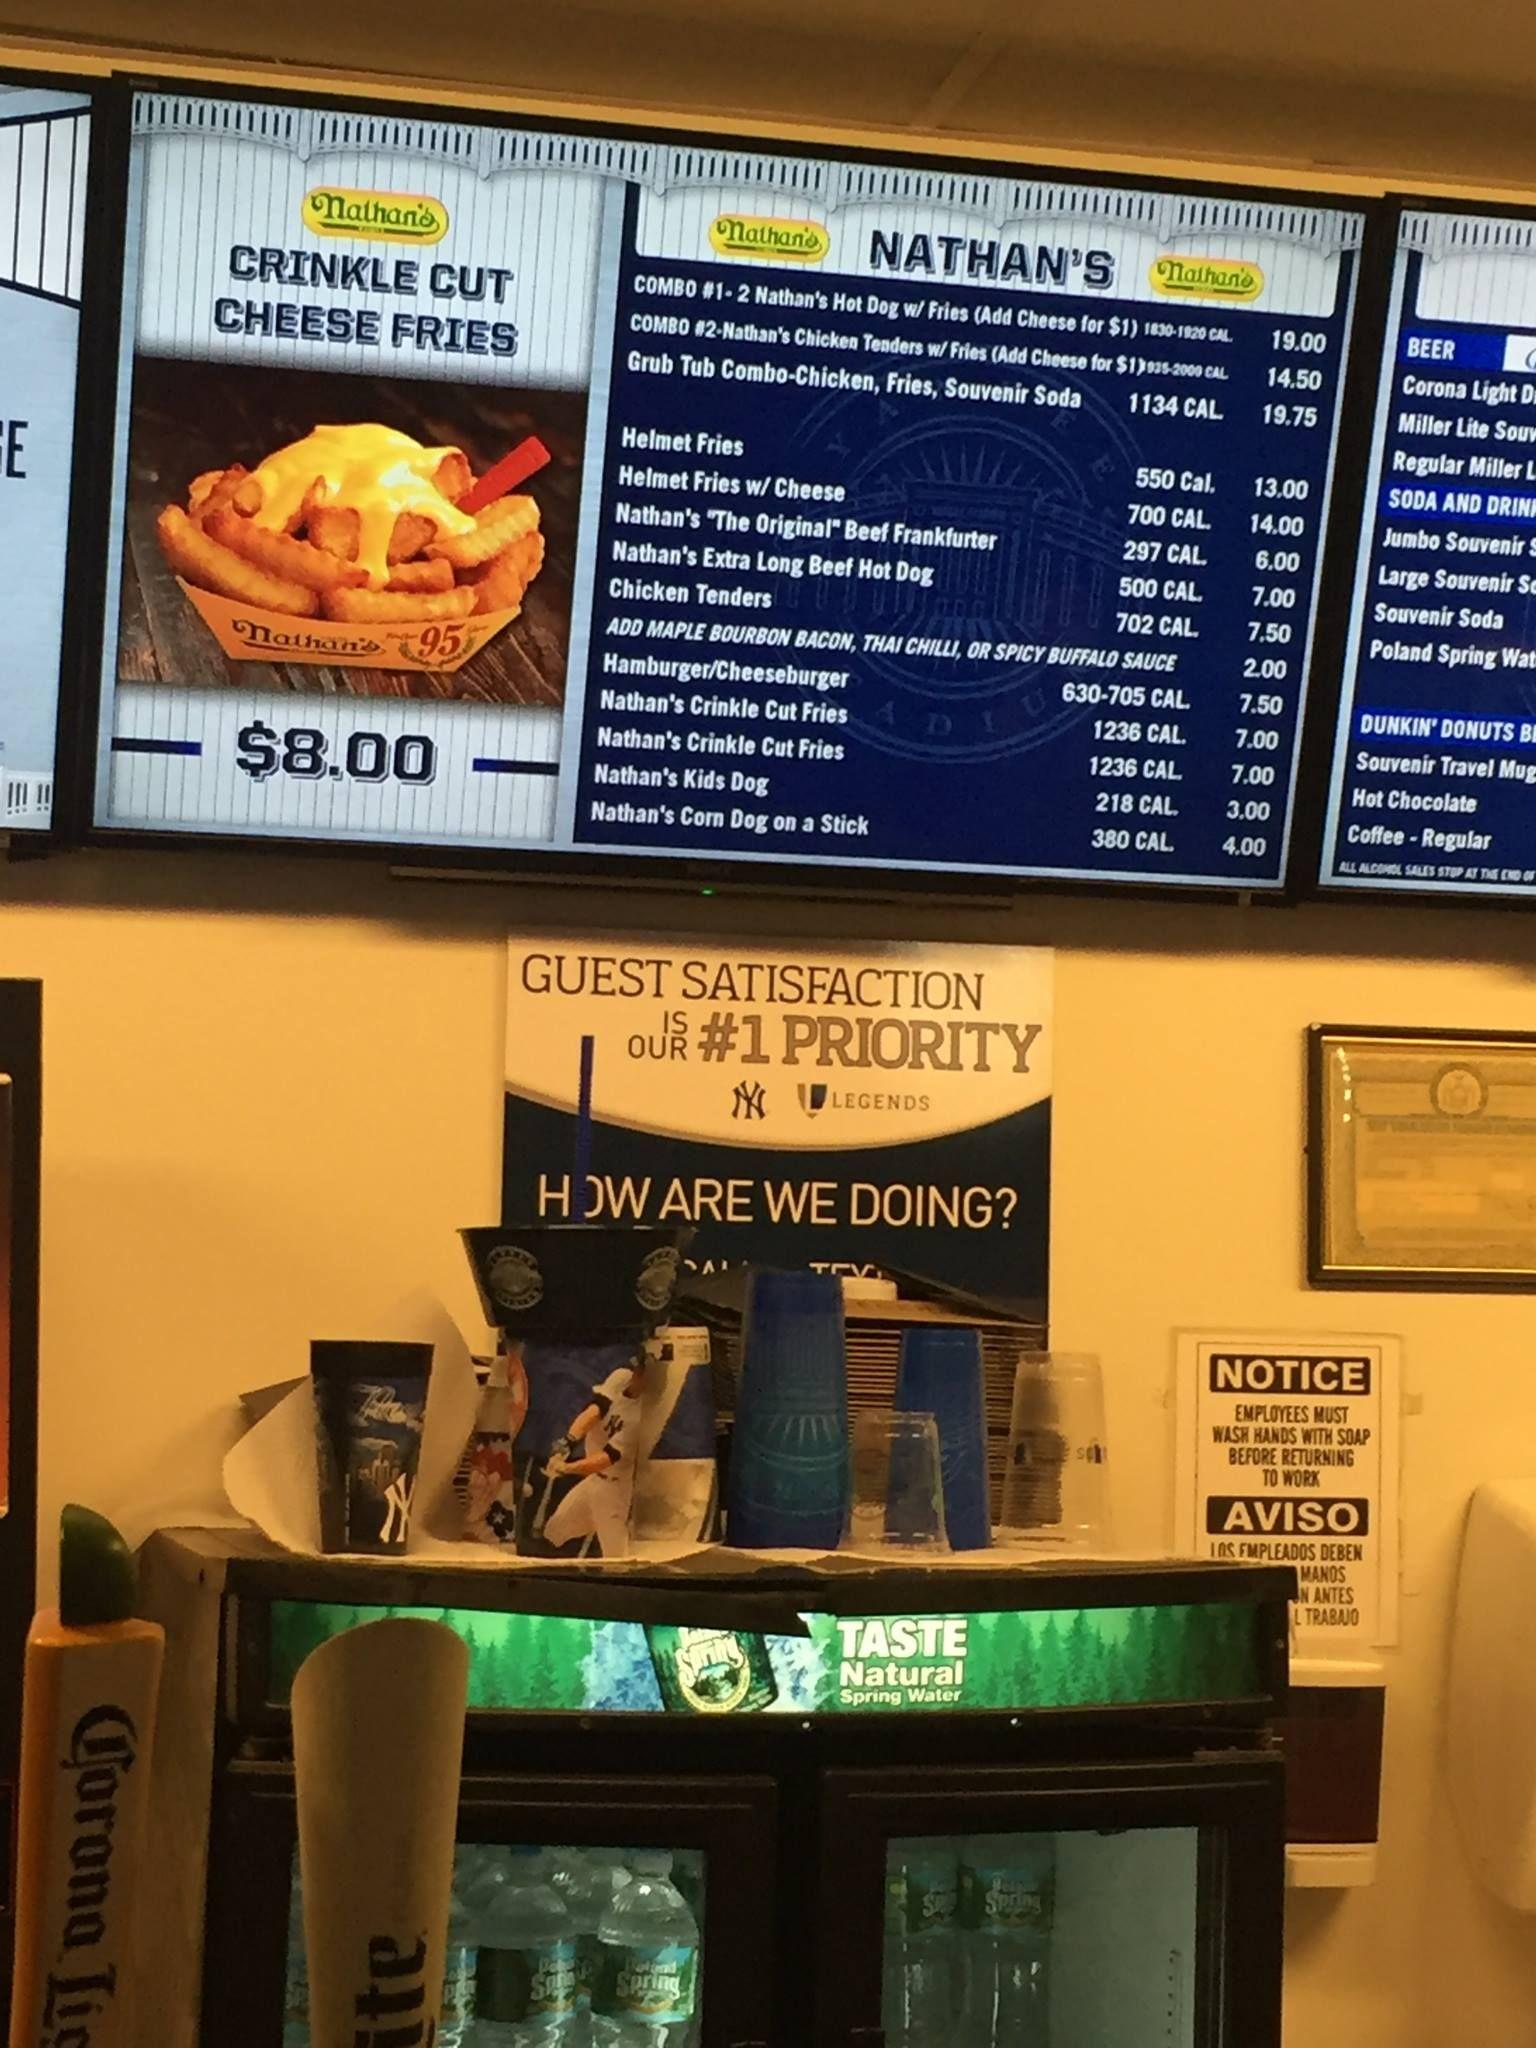 Grub Tub On Display Yankees Menu Board Cheese Fries Hot Chicken Grubs